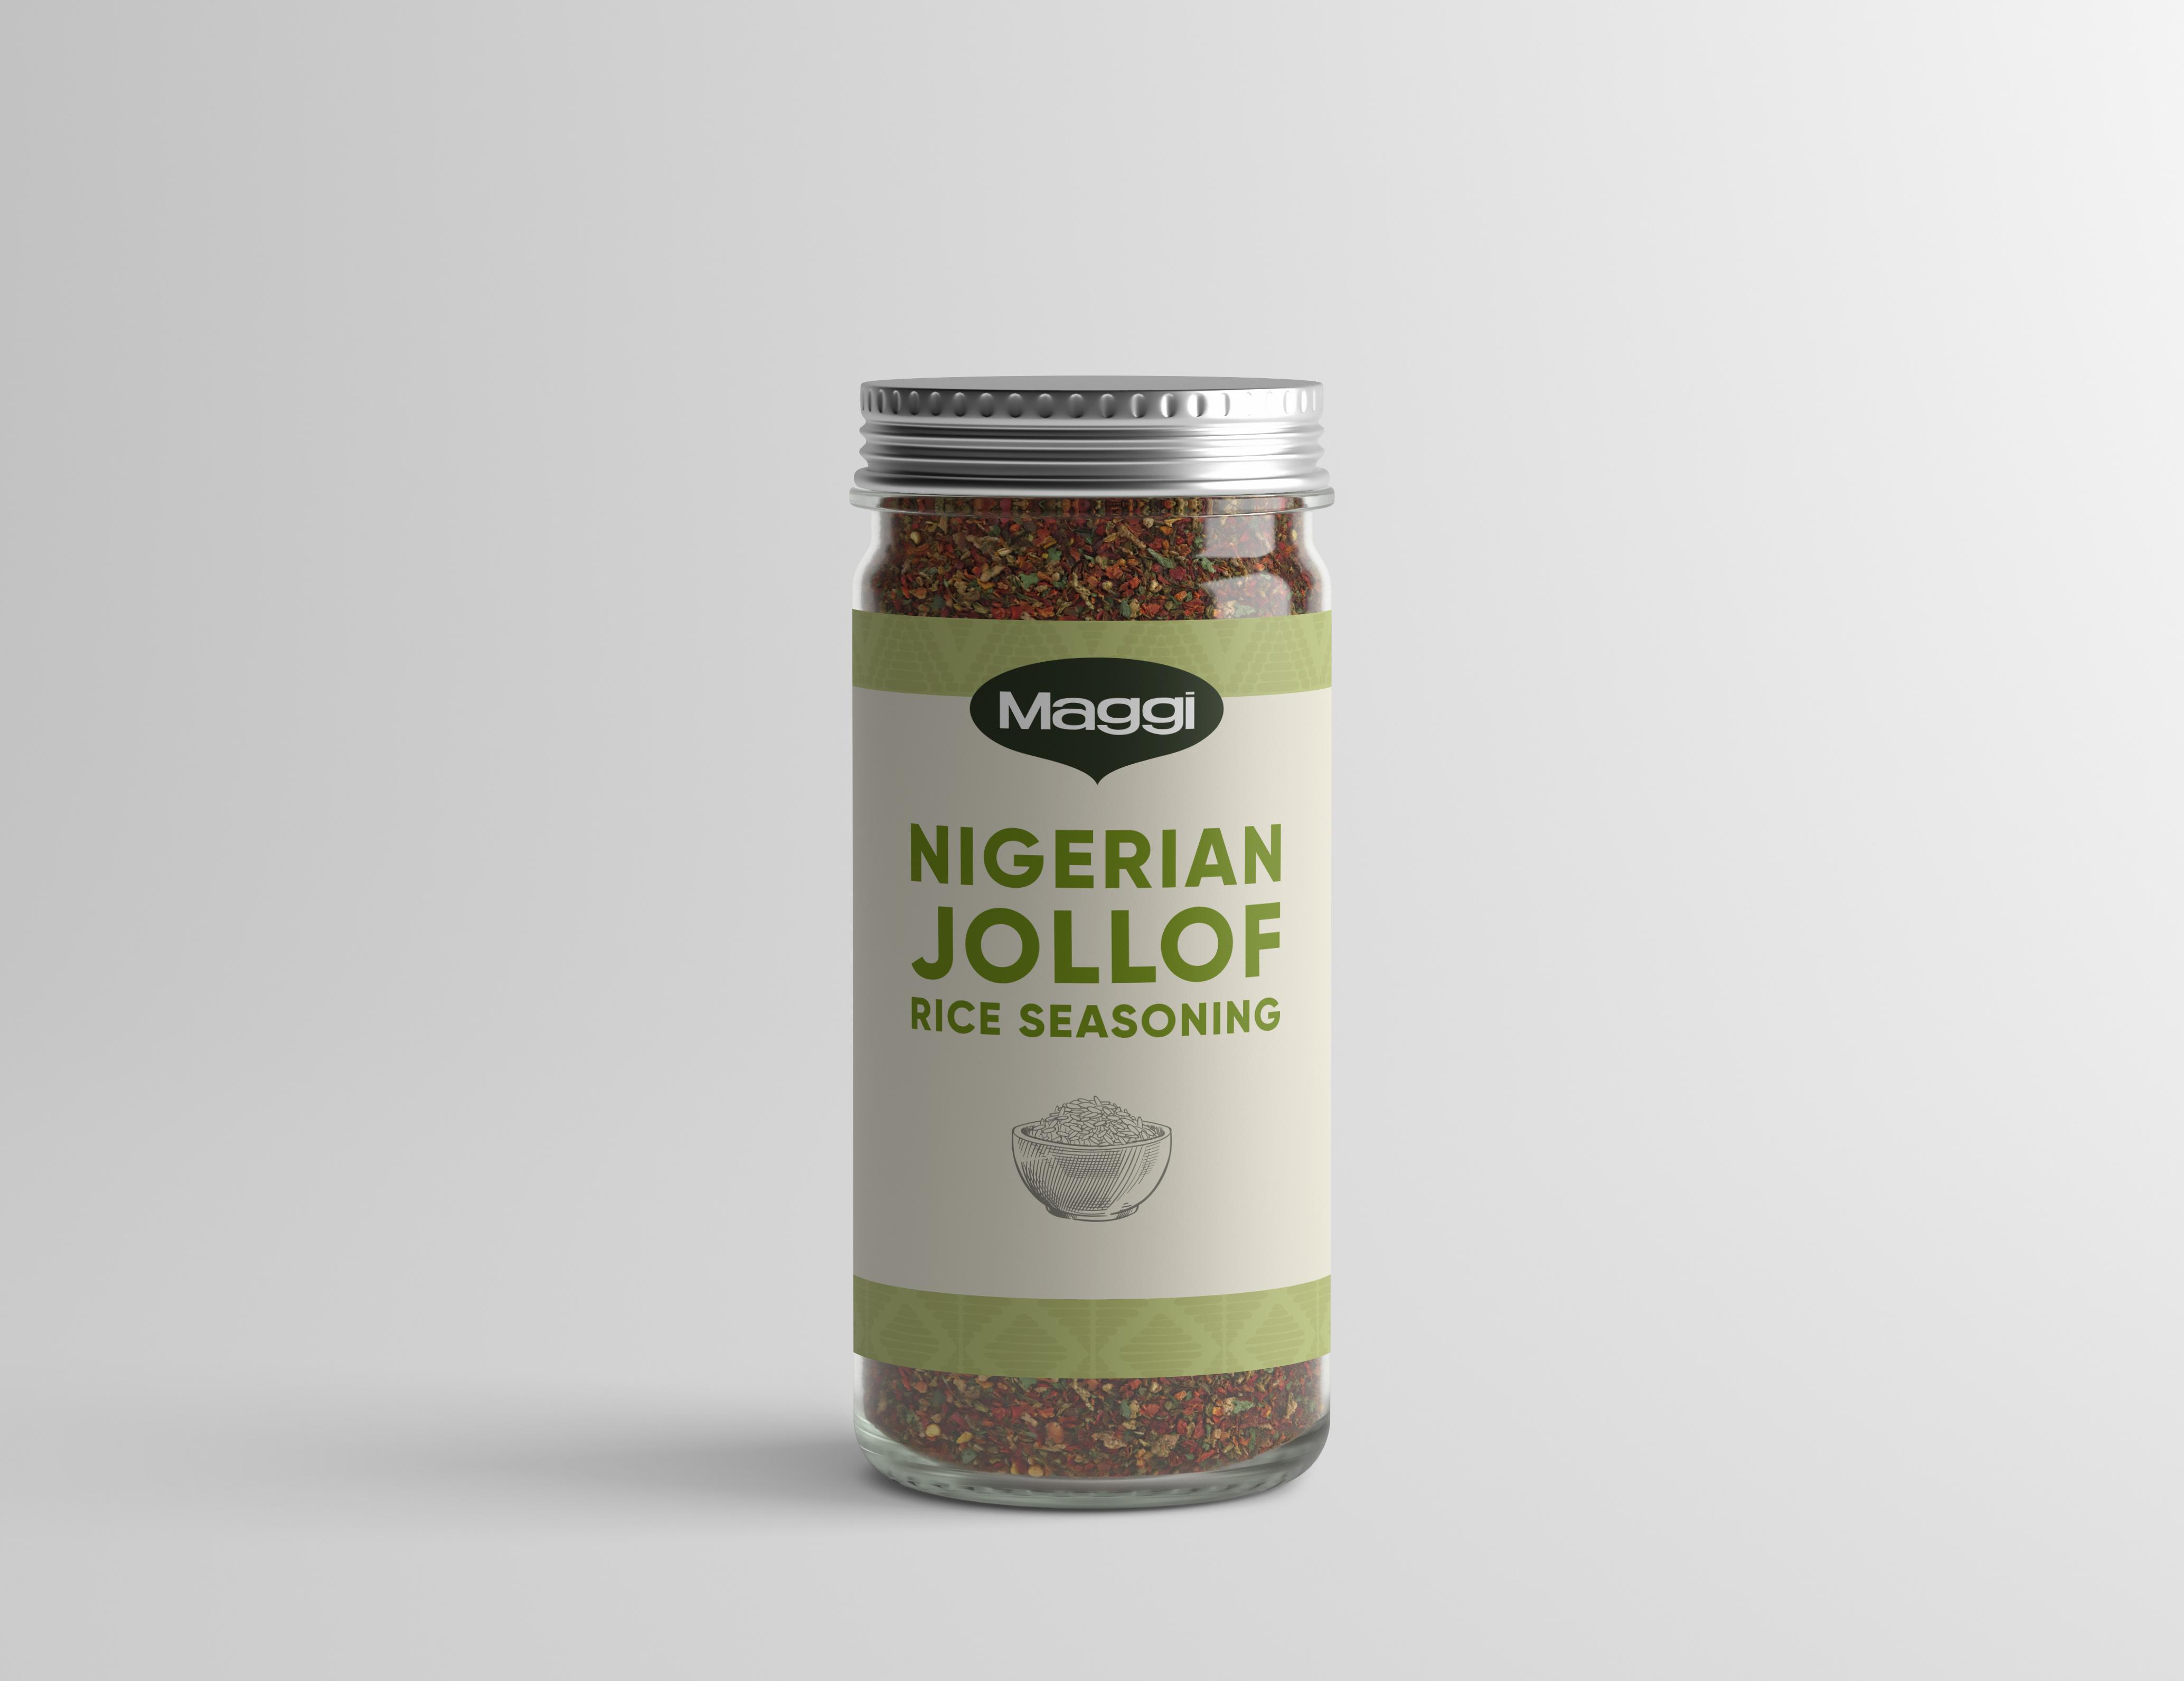 A spice bottle labeled Nigerian Jollof Rice Seasoning